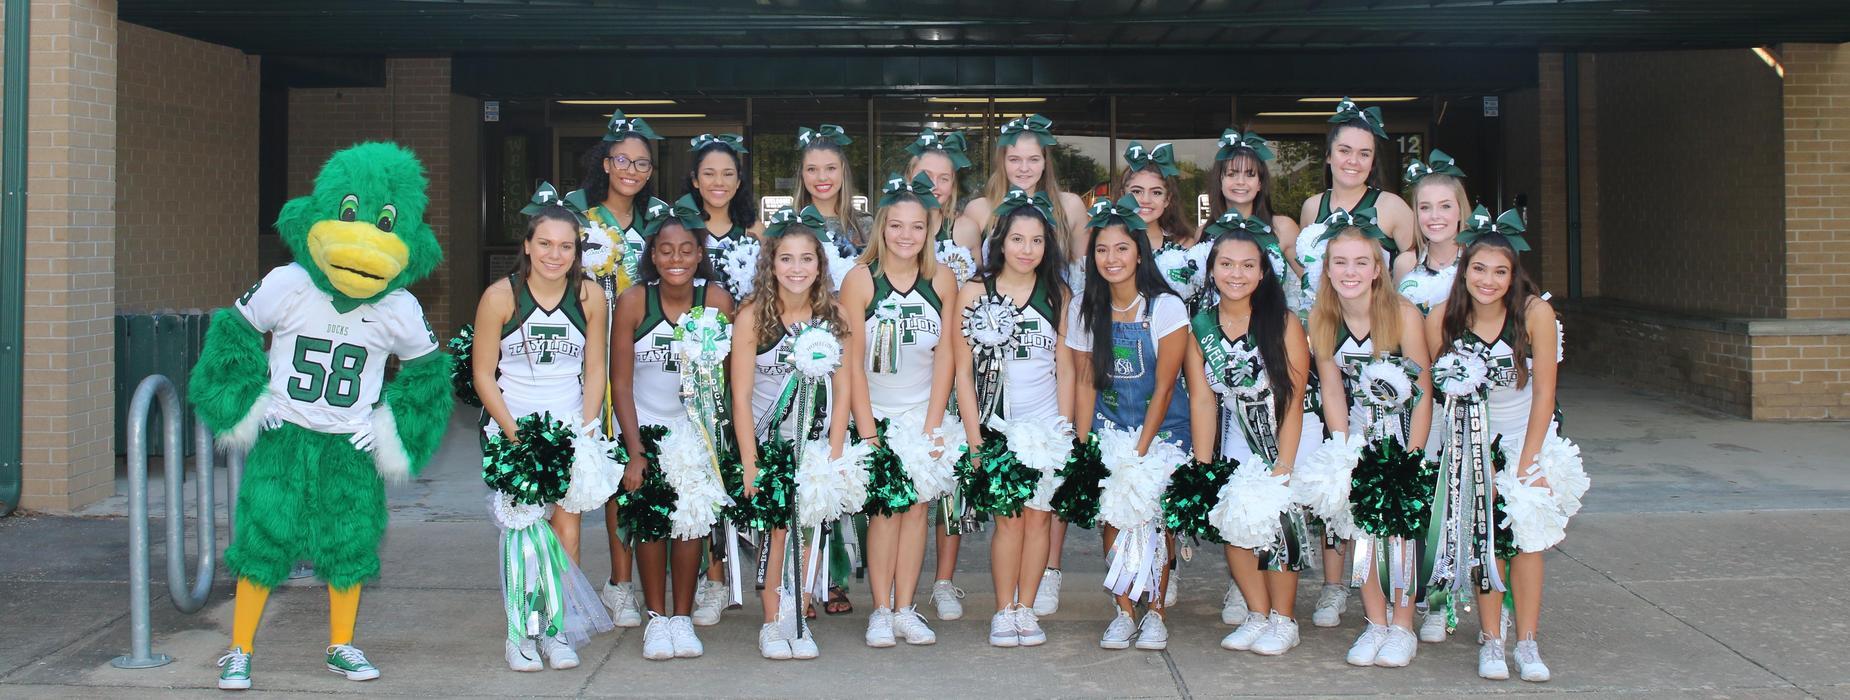 Cheerleader Group